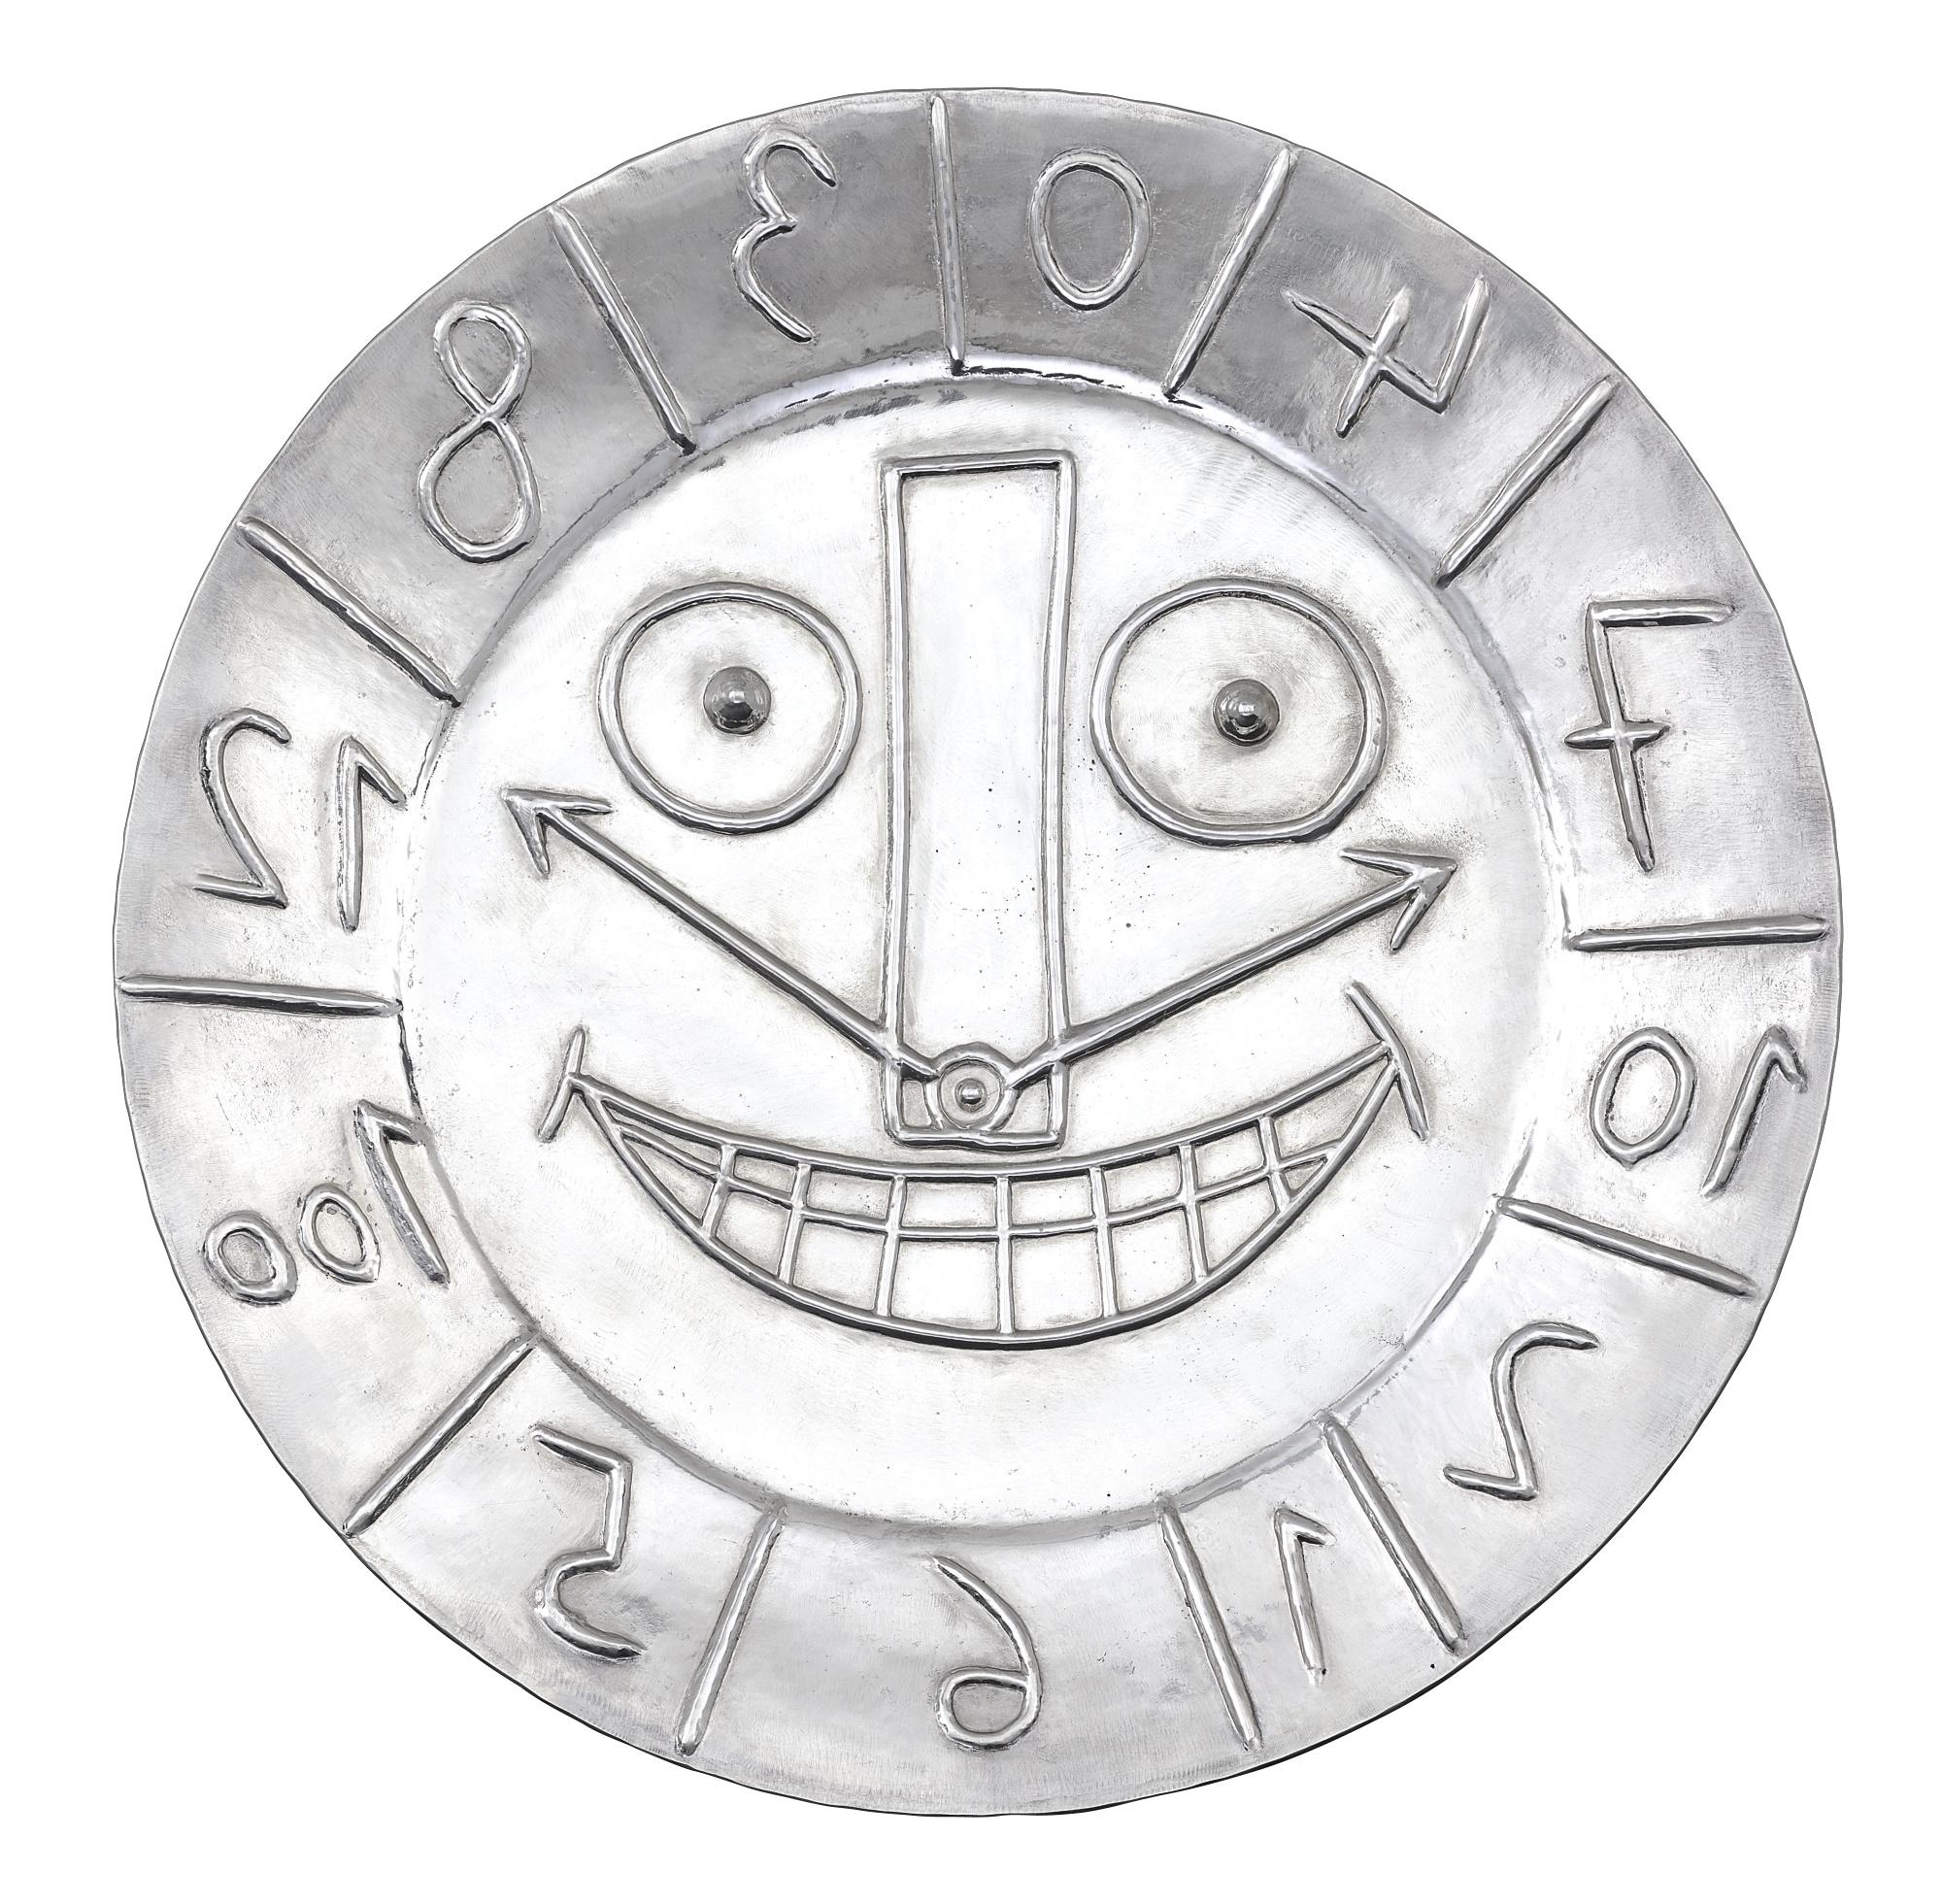 Pablo Picasso-Visage En Forme D'Horloge-1967